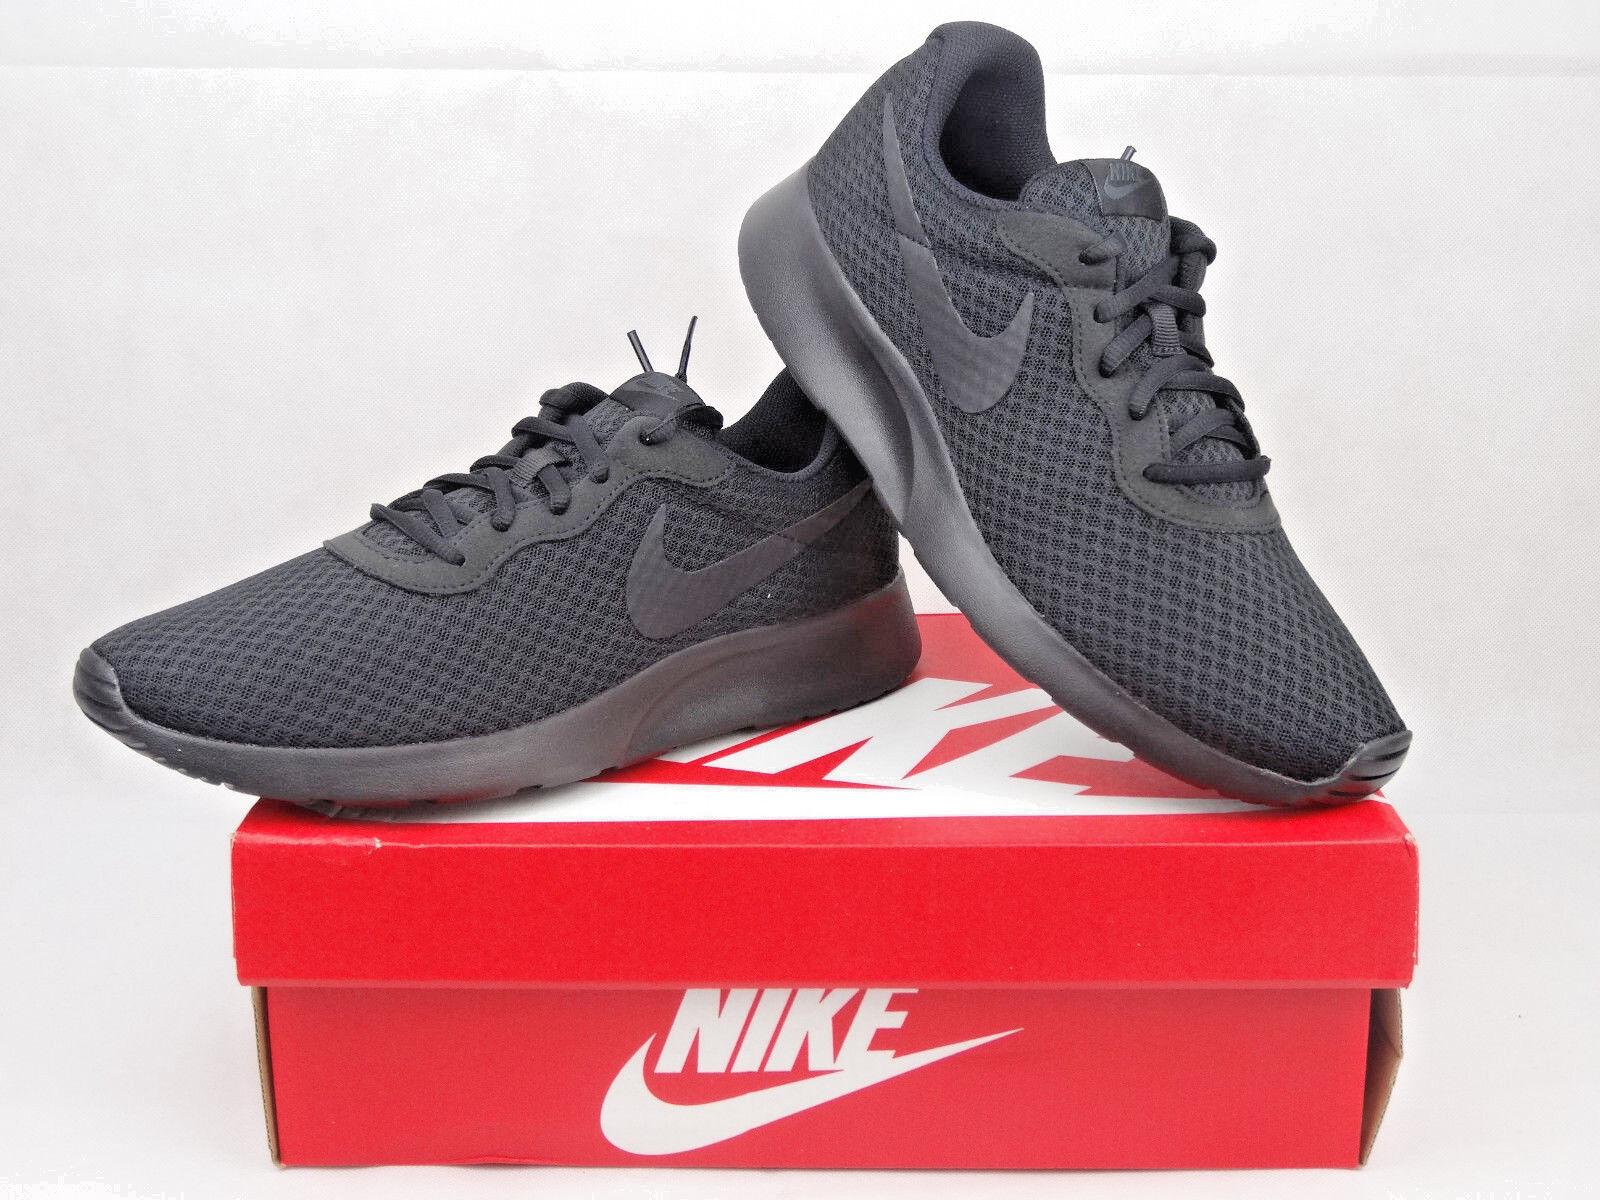 Descuento de la marca Nike Tanjun Entrenadores Hombres Zapatos Talla Uk 9.5/EU 44.5 Negro